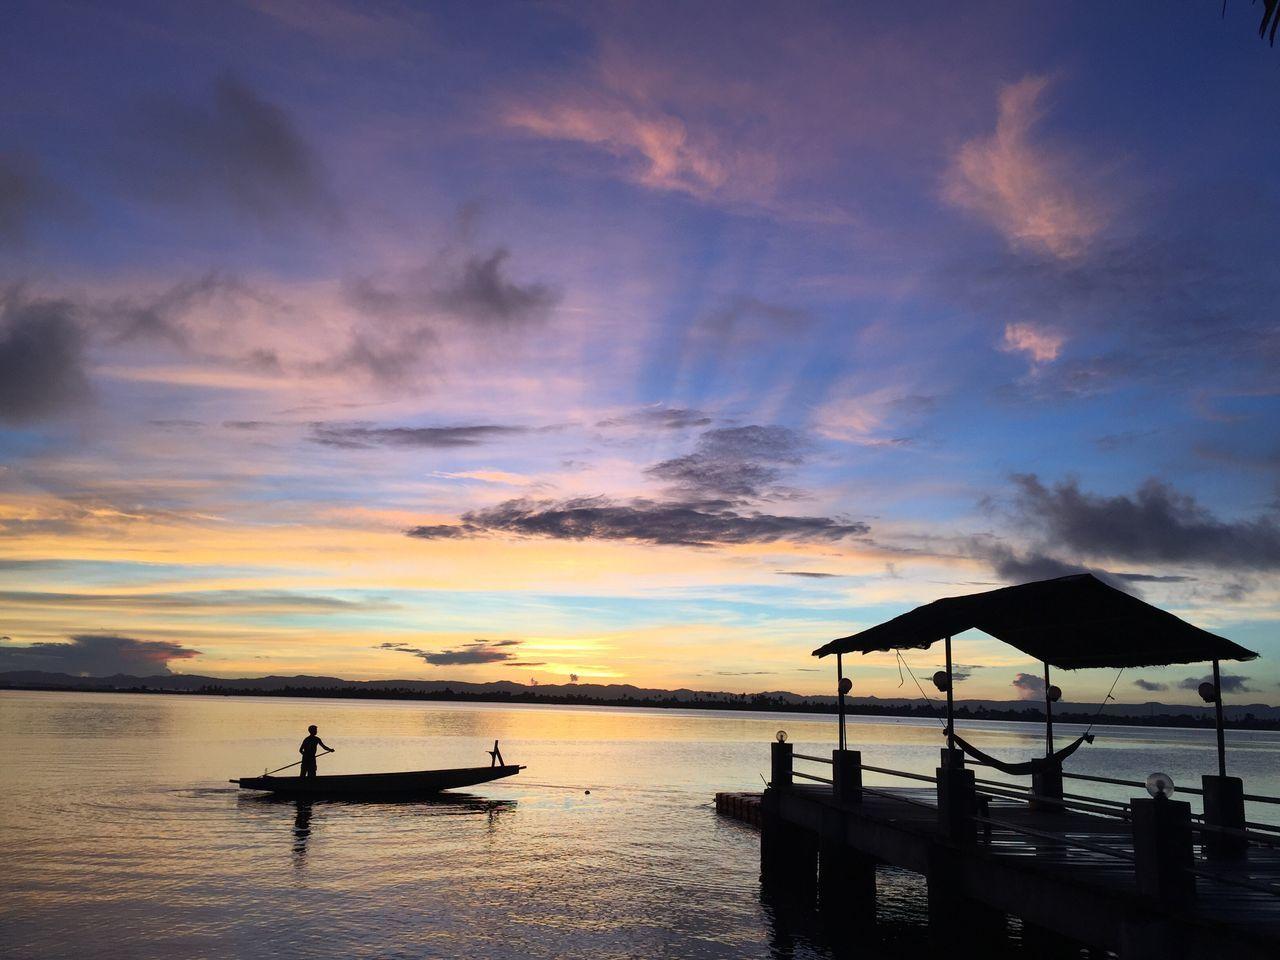 June 23, 2016. Cancabato Bay. Unfiltered beauty. TaclobanSalties